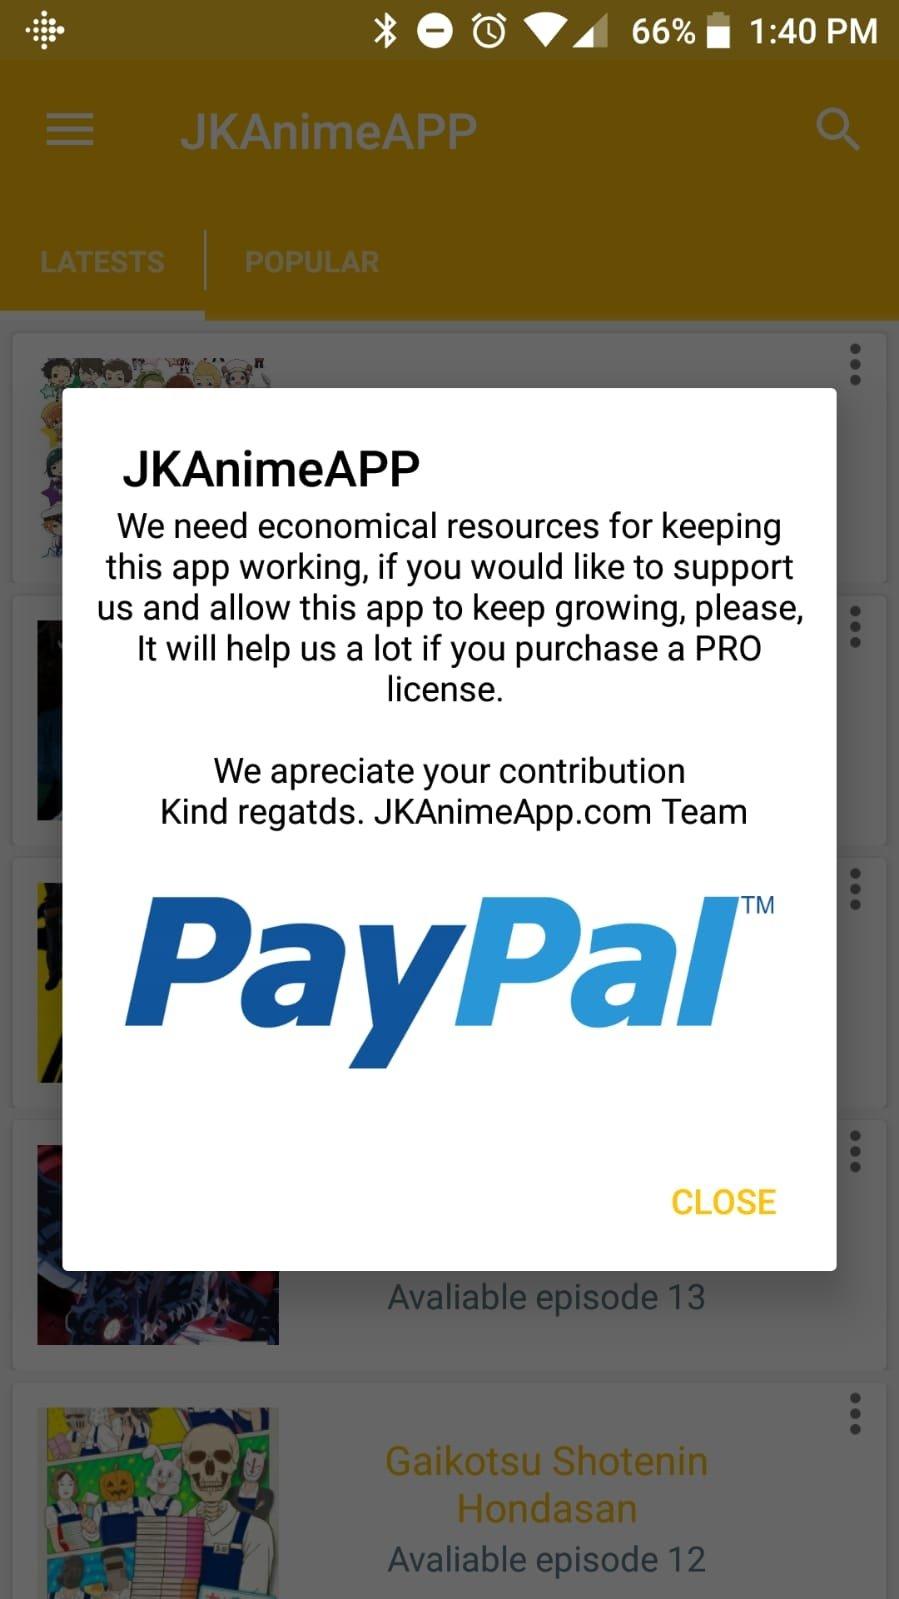 22+ Jkanime App Pro Apk Images